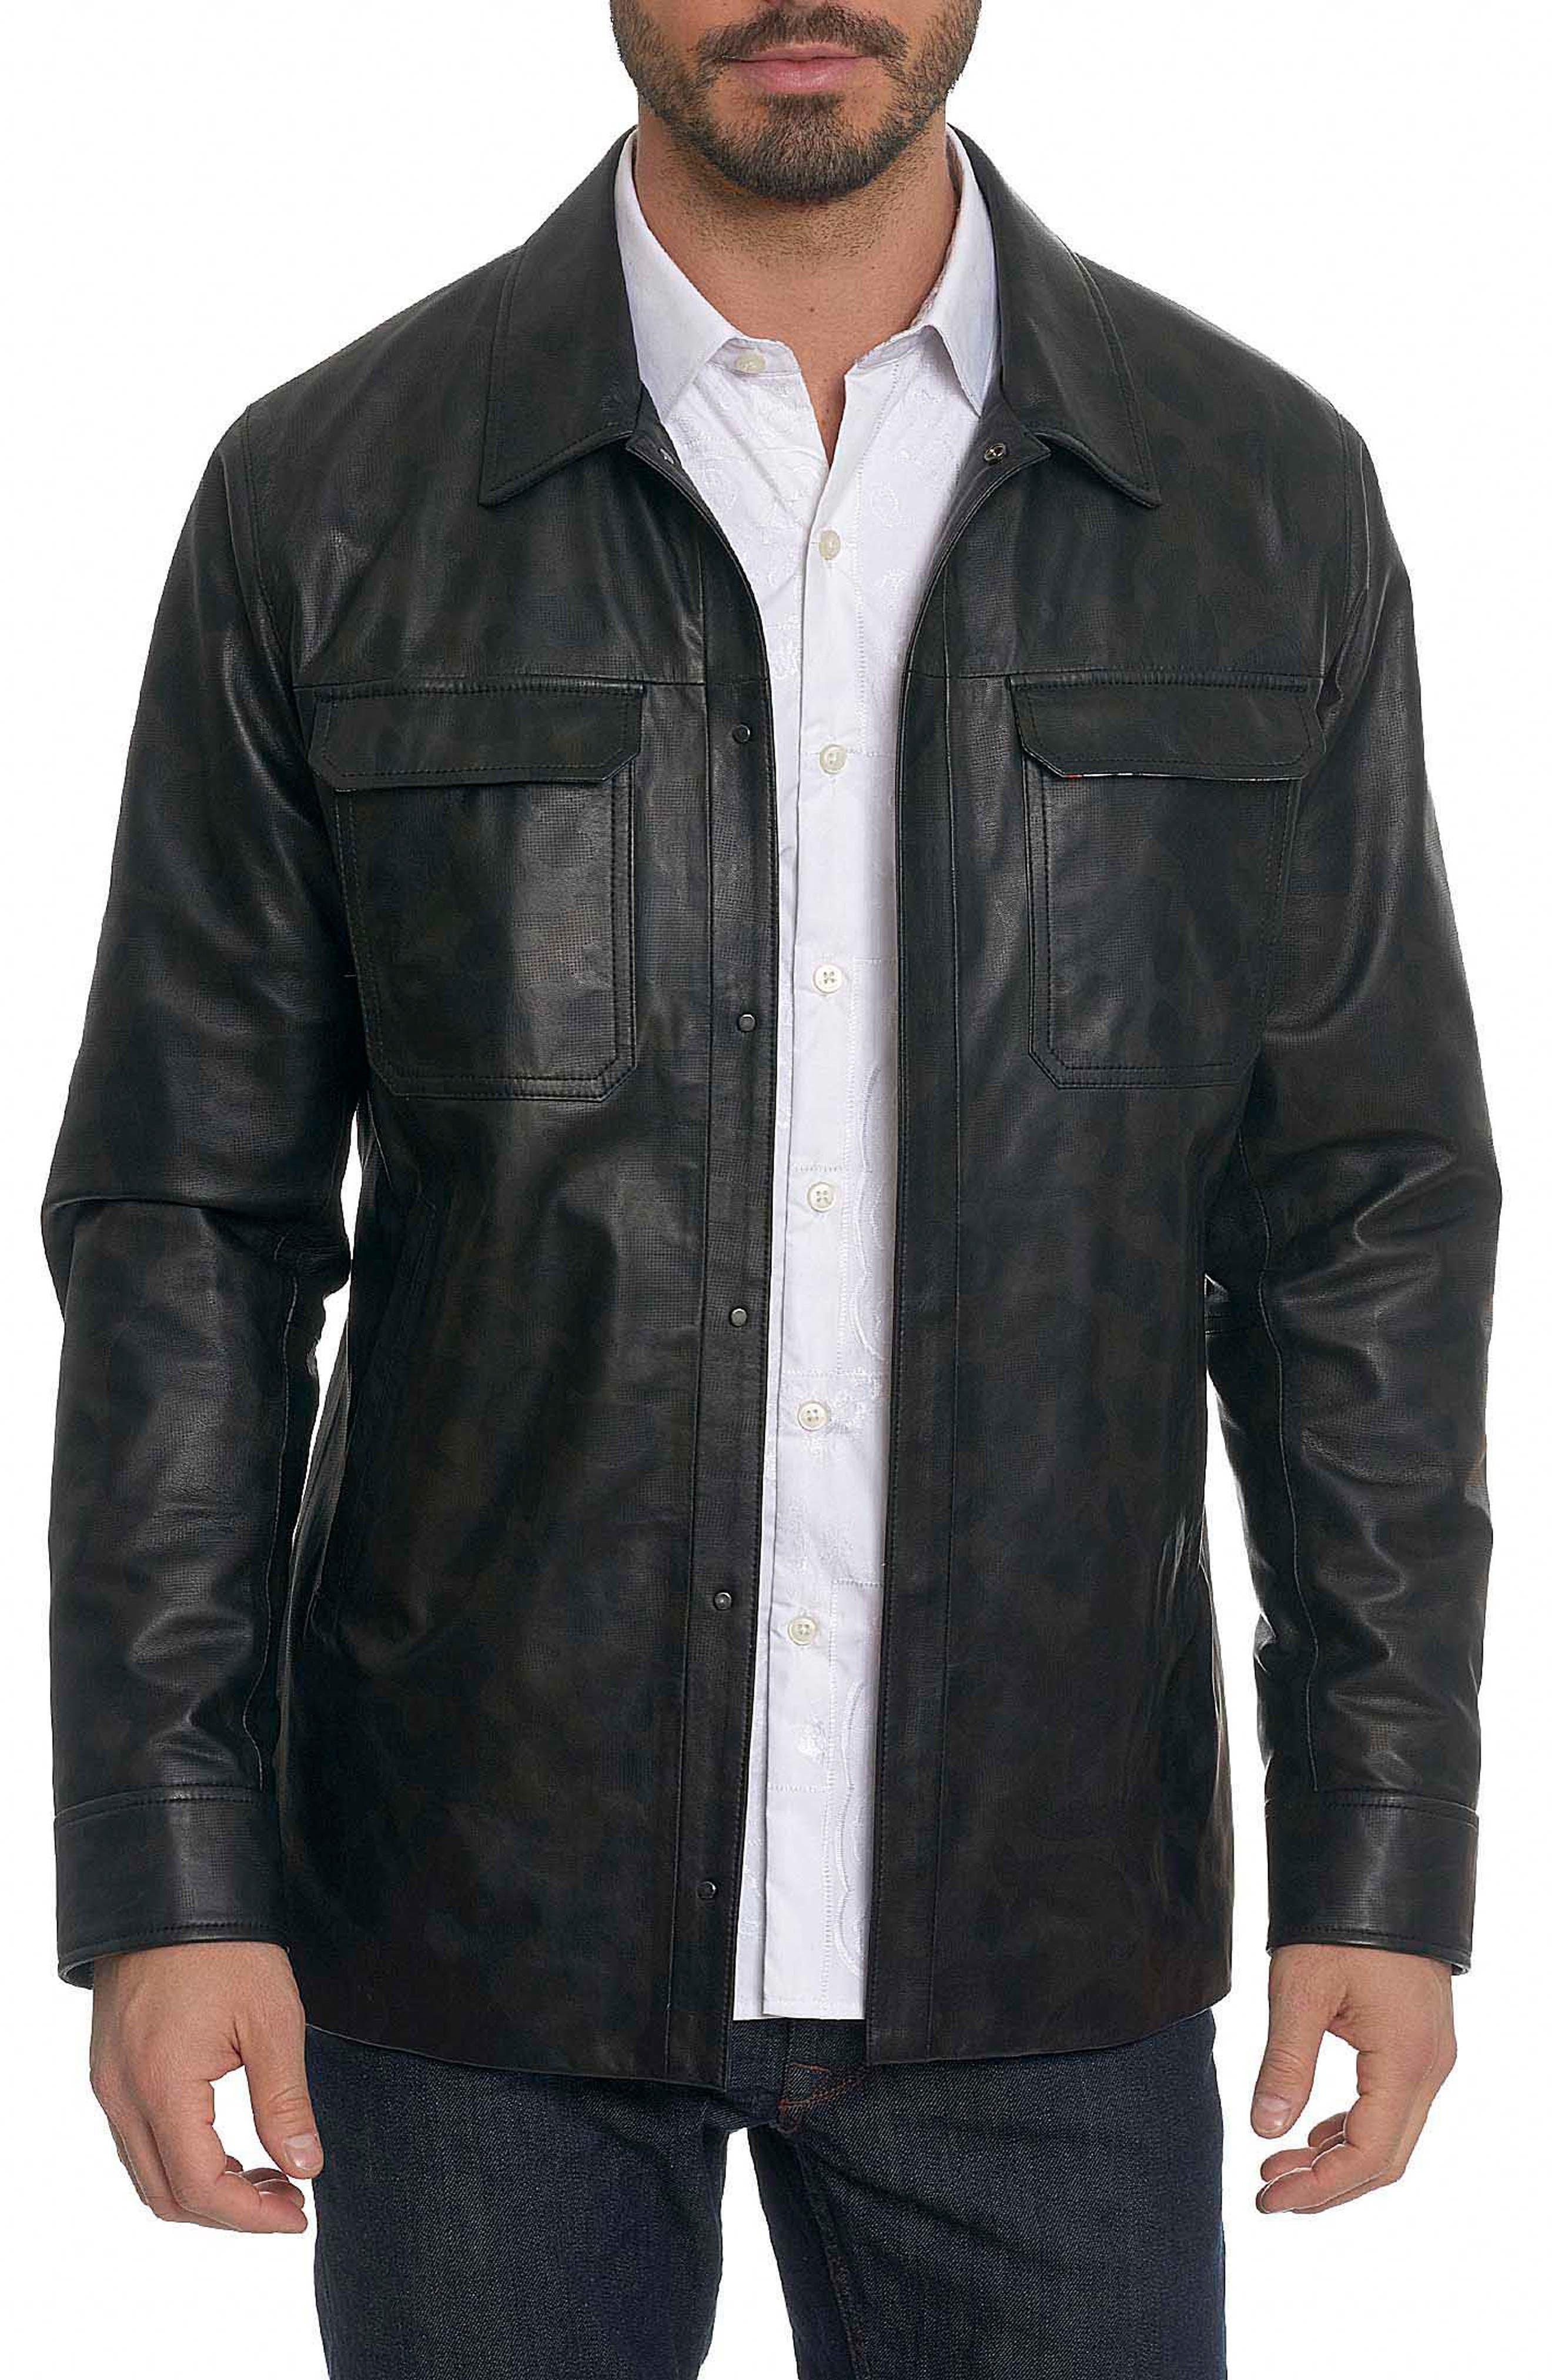 Colden Camo Leather Shirt Jacket,                             Main thumbnail 1, color,                             Black